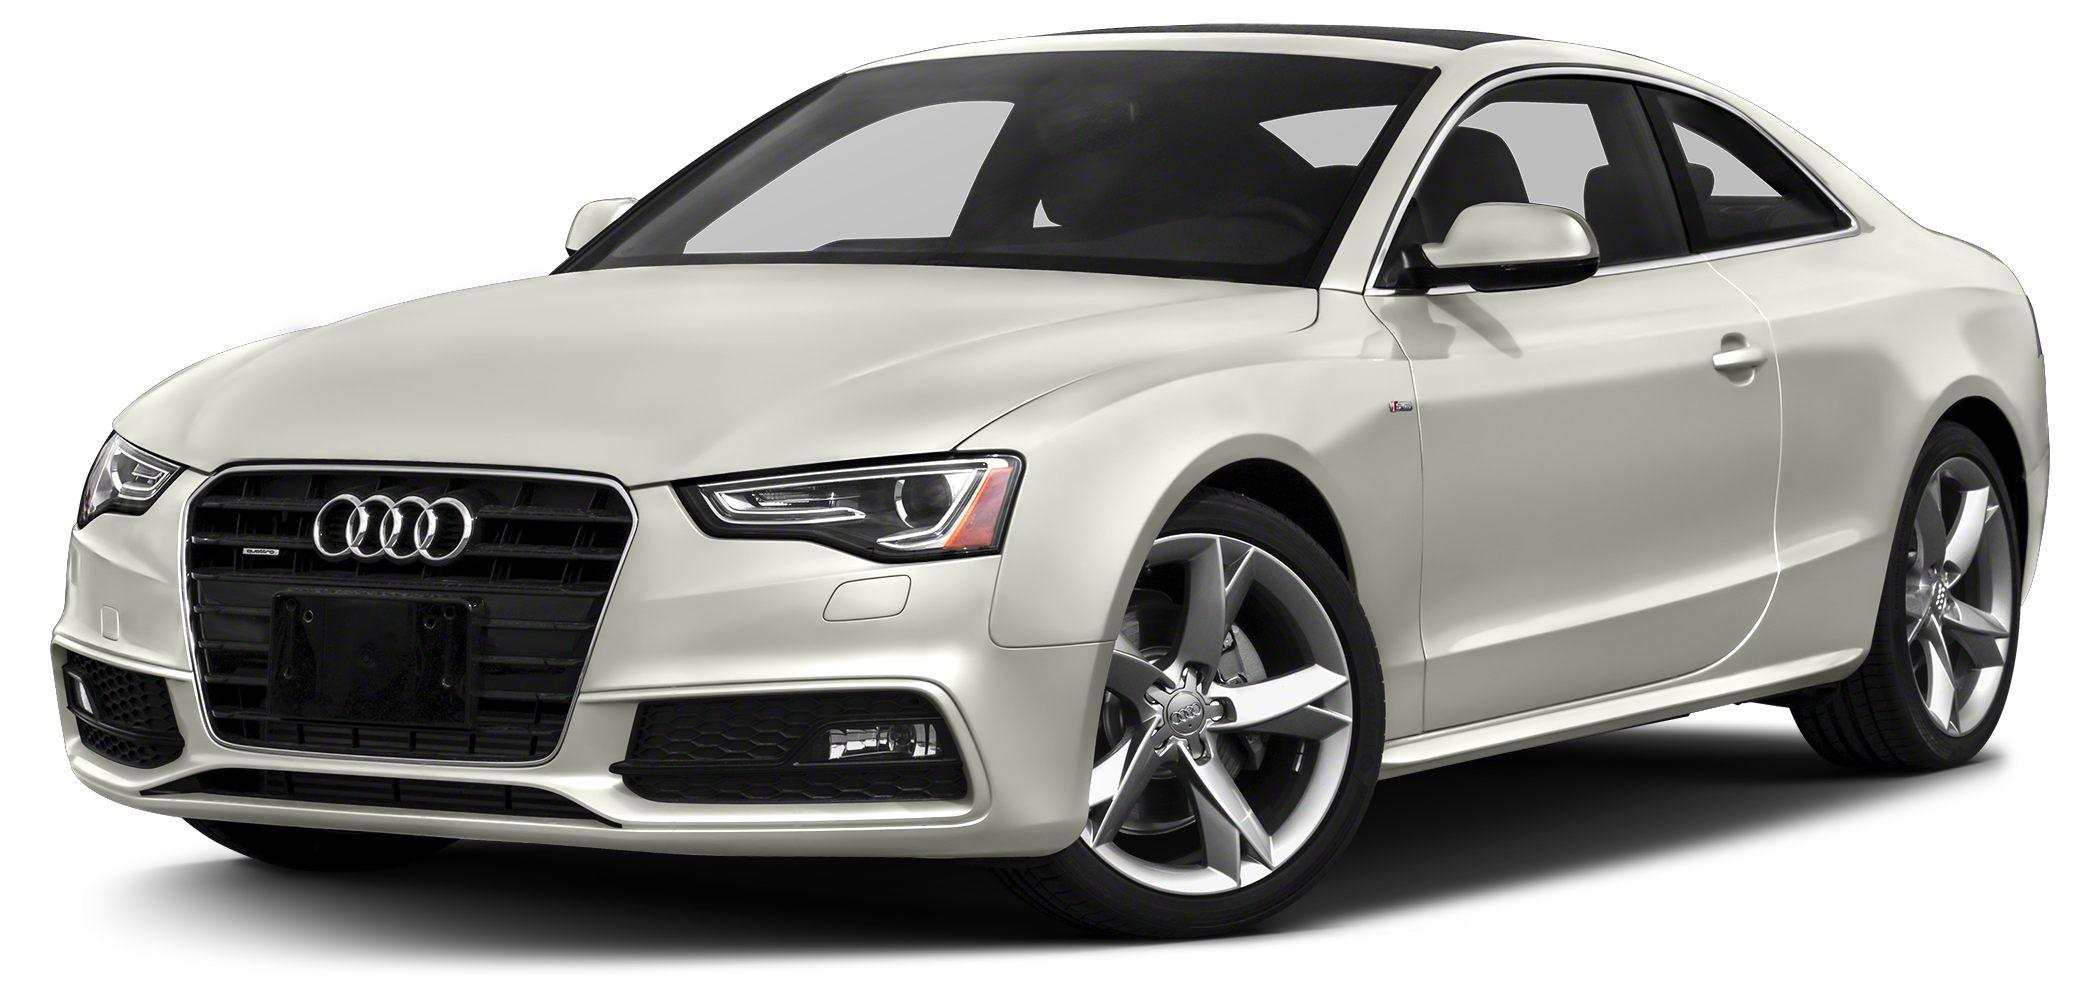 2014 Audi A5 20T quattro Premium Miles 20085Color Ibis White Stock 008954 VIN WAUCFAFR1EA00